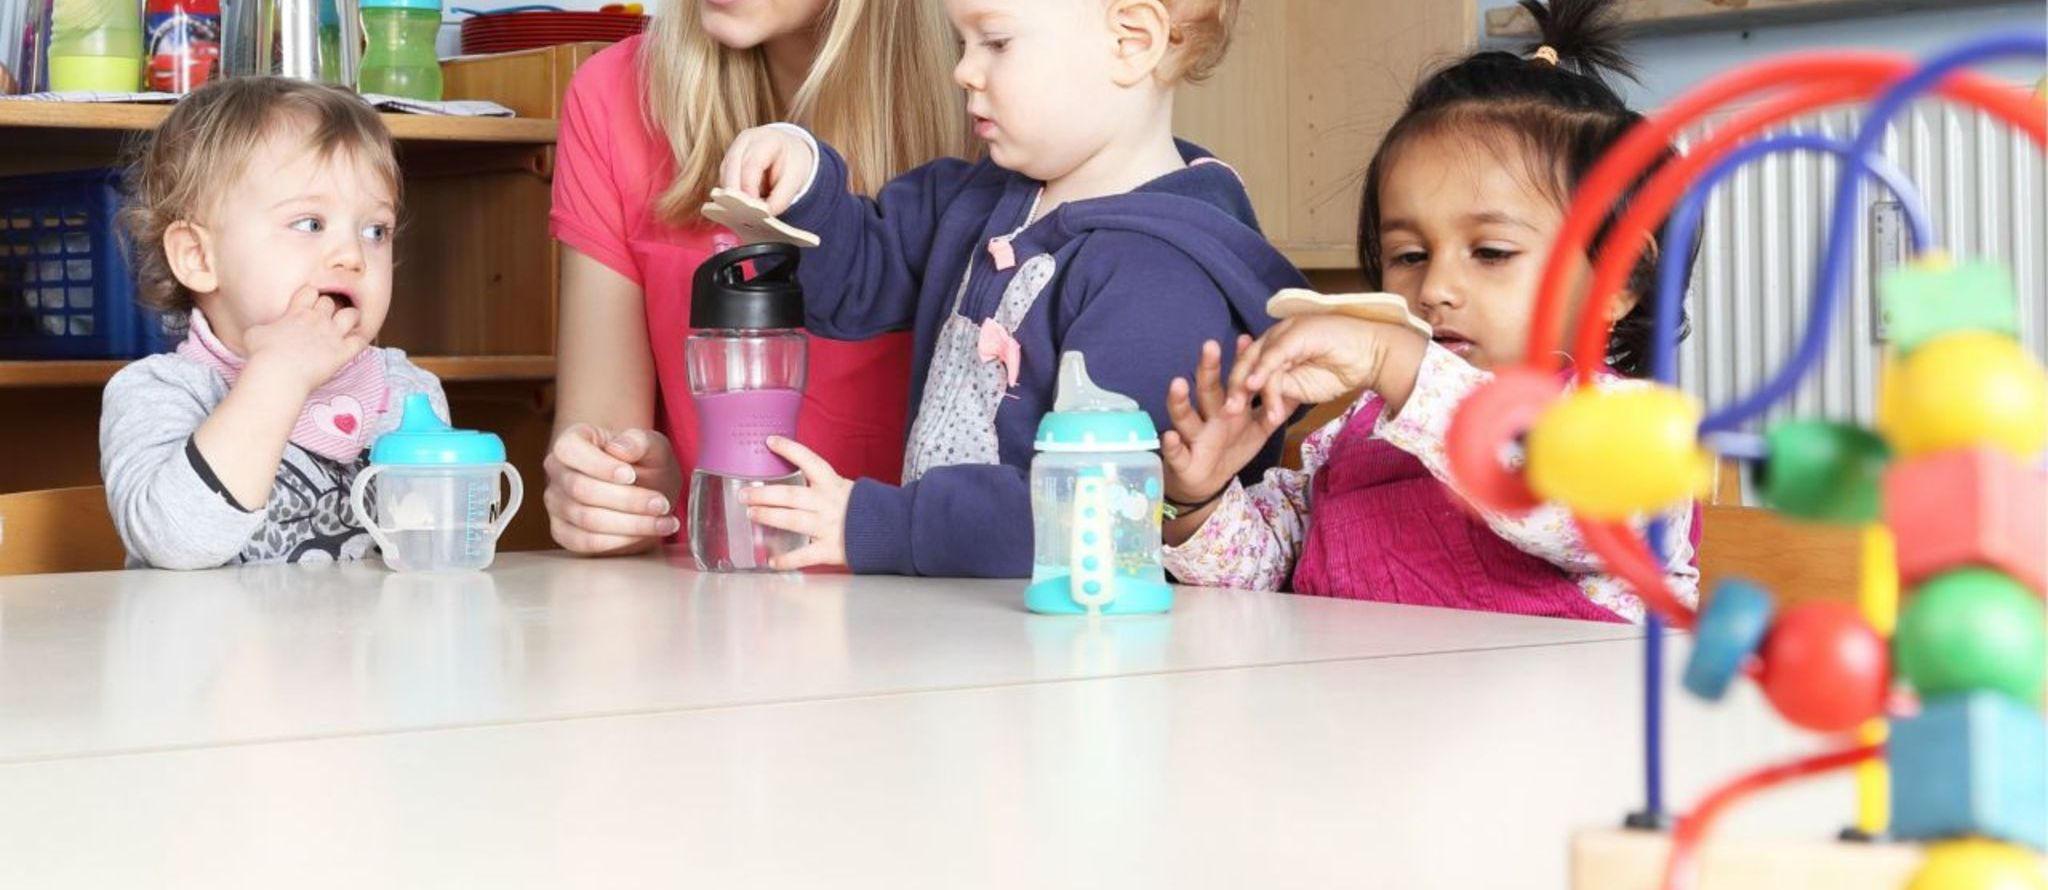 Brandveiligheid kinderdagverblijven